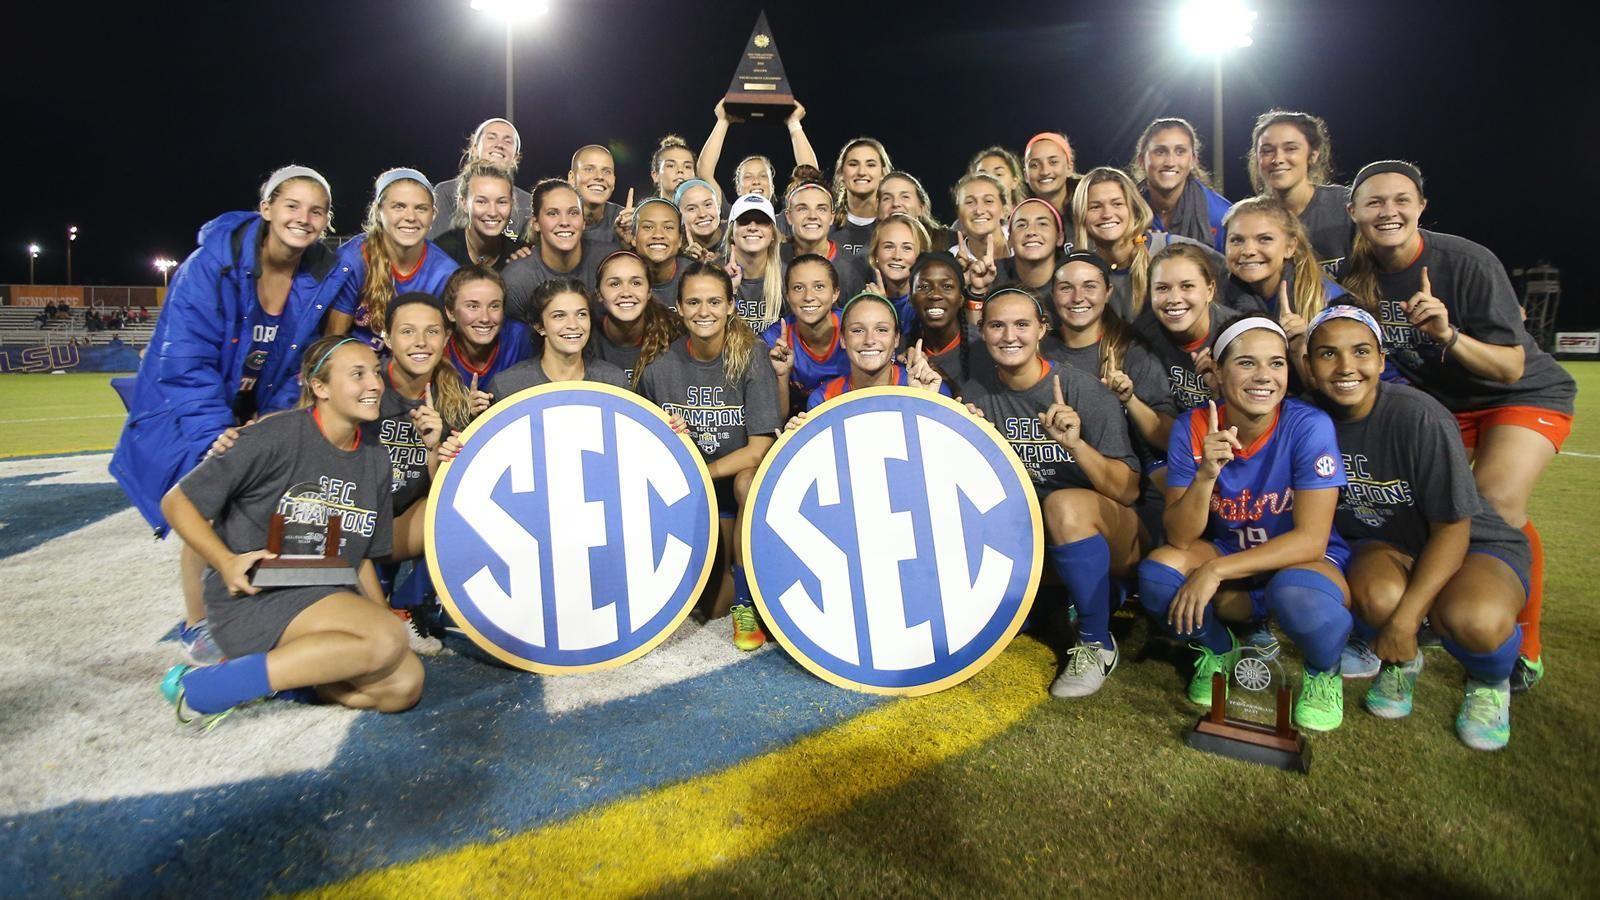 Gators repeat as SEC Tournament champions